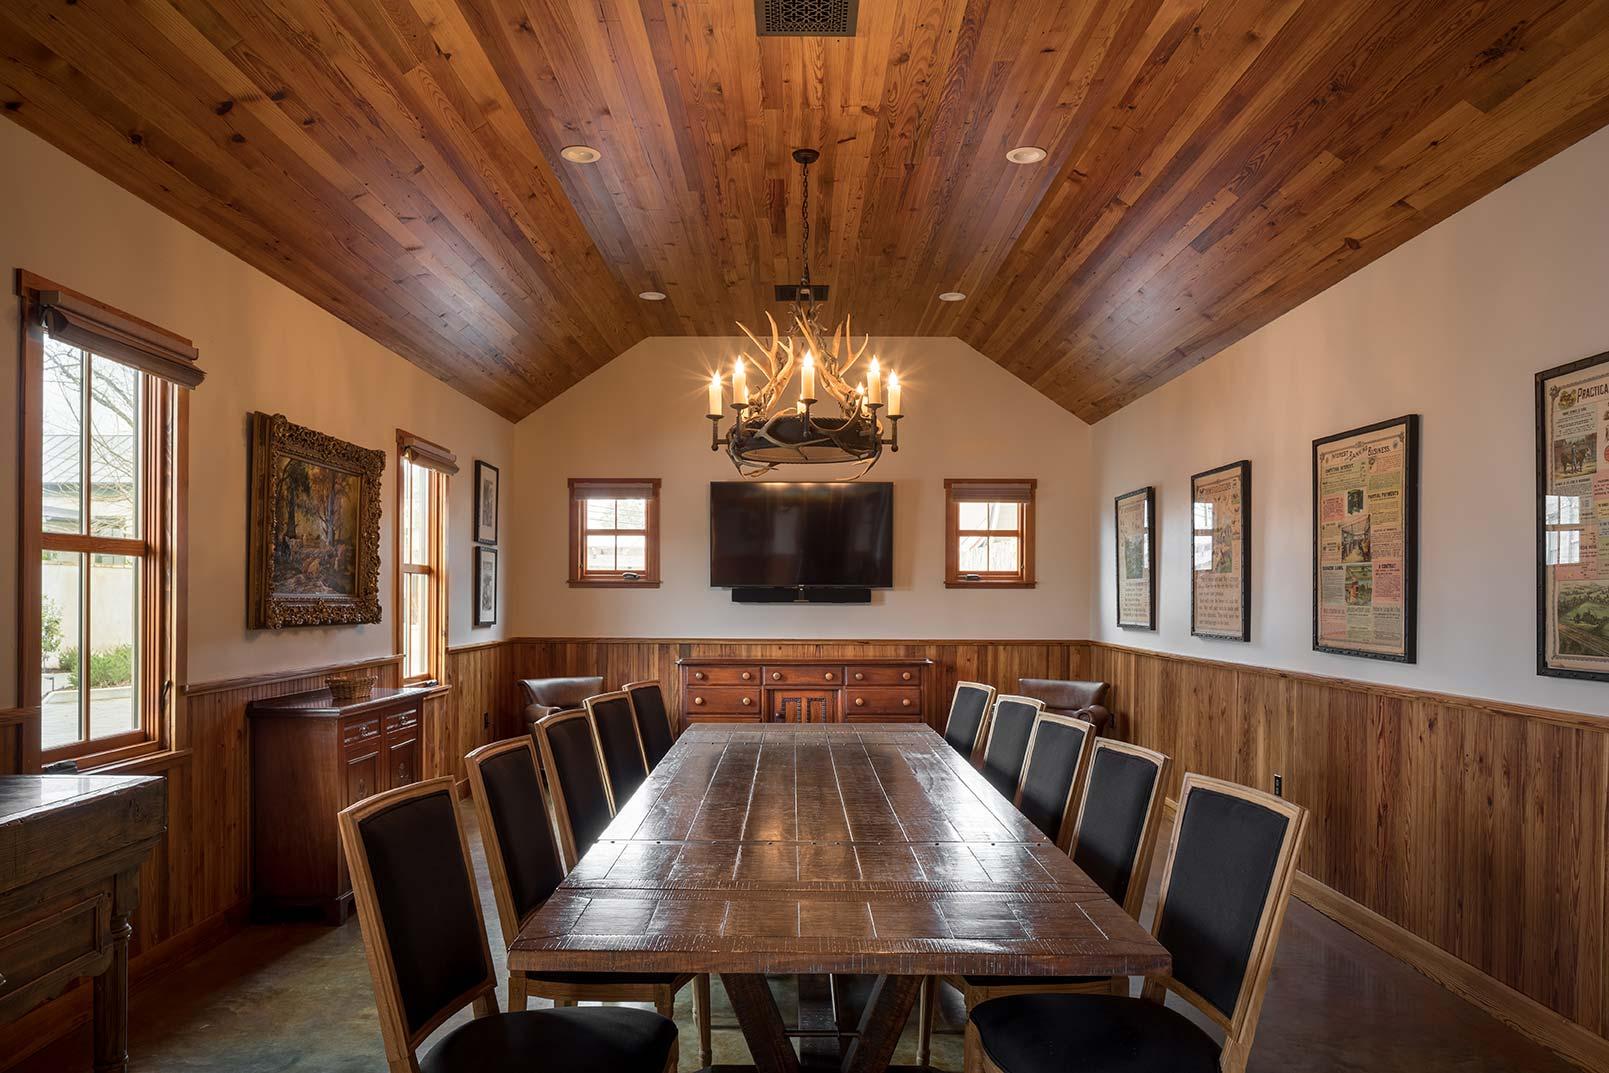 blacksmith-quarters-fredericksburg-realty-texas-commercial-real-estate-for-sale-open-space.jpg